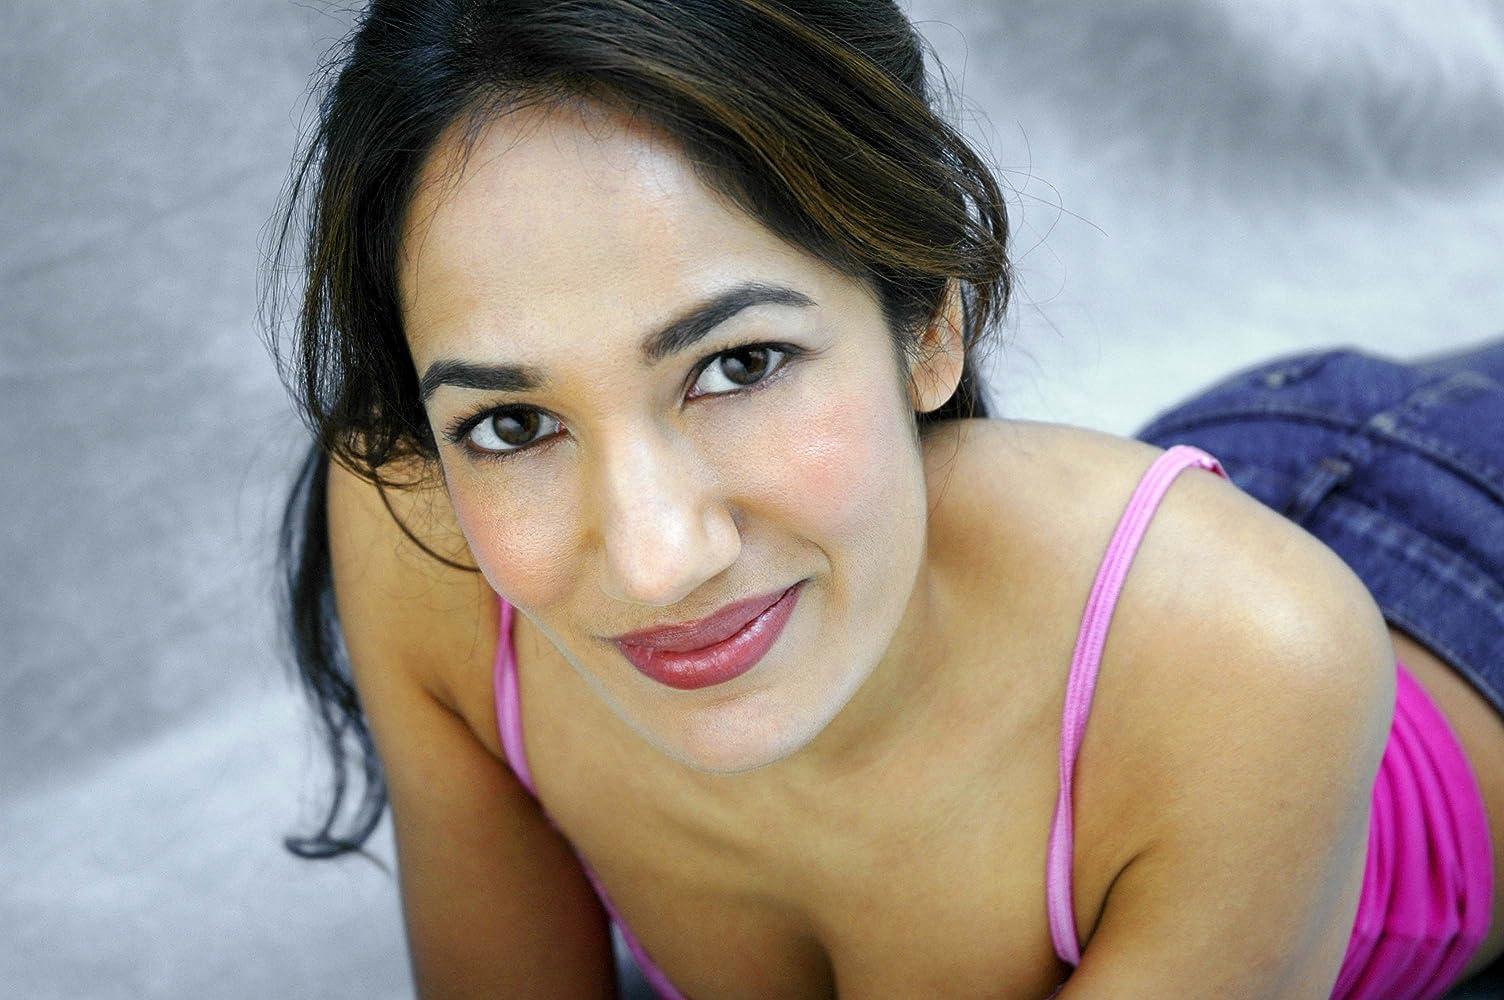 Bhagyashree Patwardhan,Virna Lisi (born 1937) Porn movies Julie Hayek,Michelle Creber